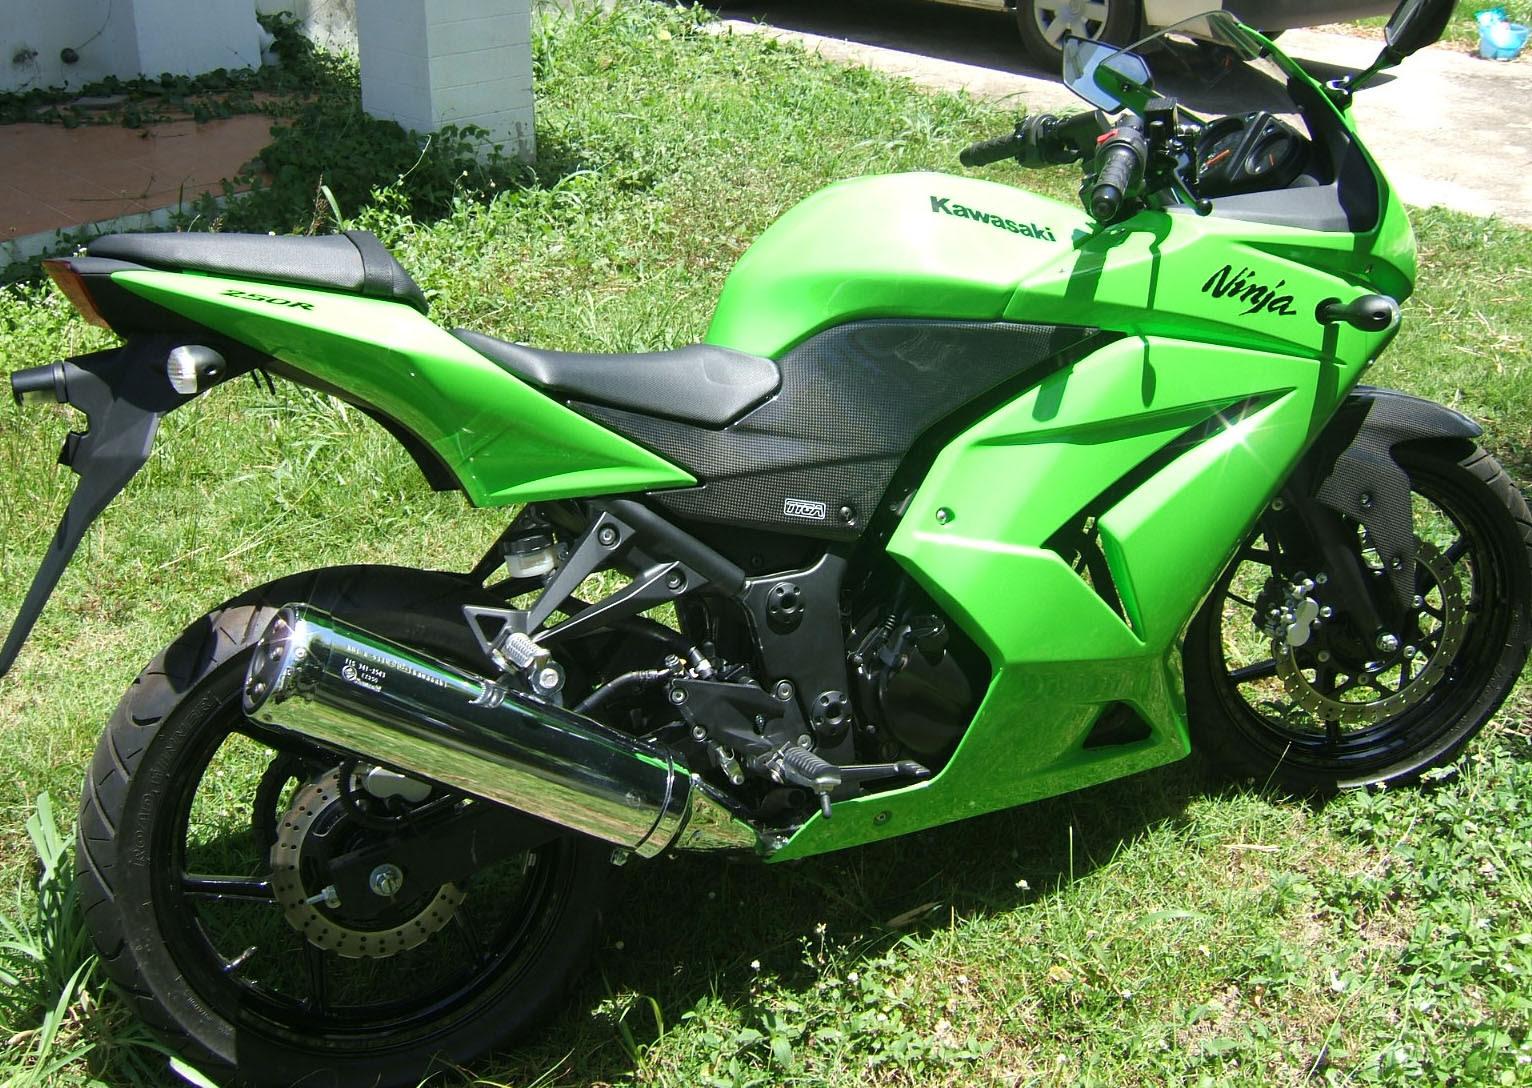 Carbon Set 2008 10 Kawasaki Ninja 250r